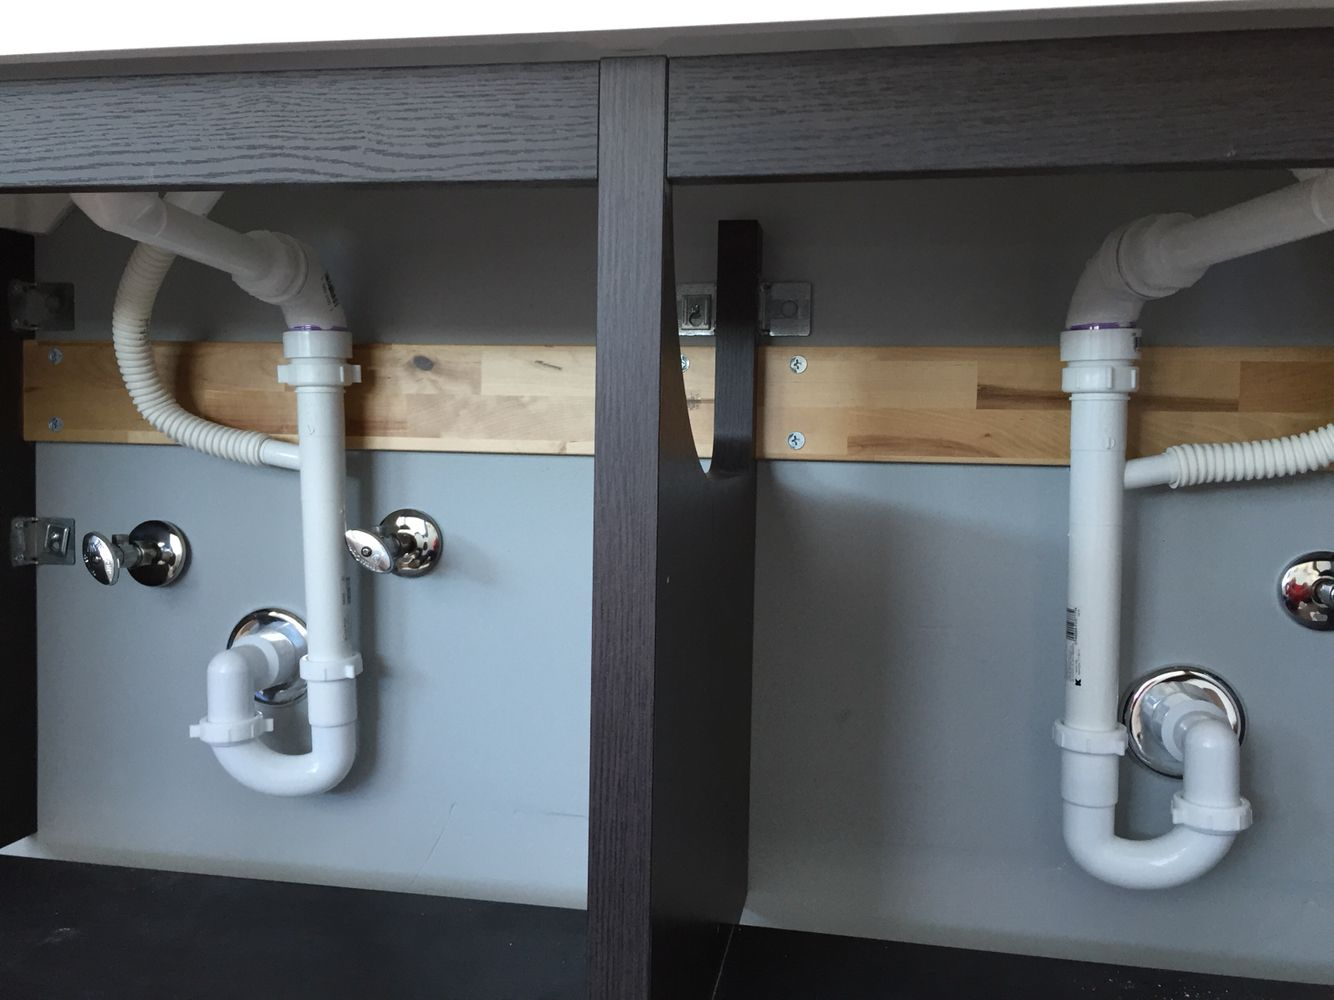 Plumbing Hack For Ikea Rinnen And Double Godmorgon Sink Trendy